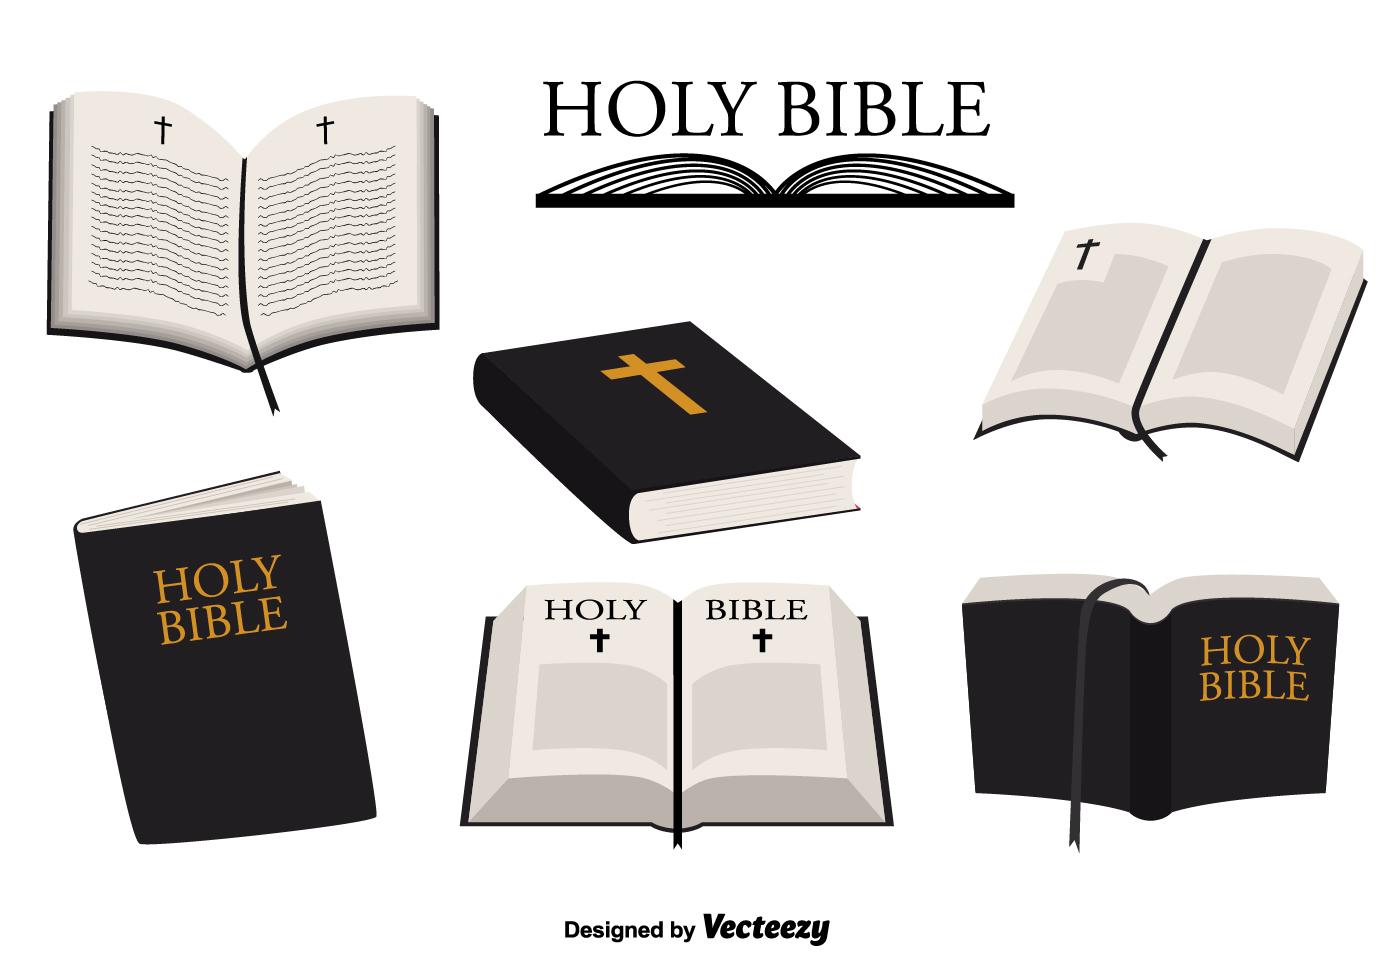 holy bible vector download free vector art  stock Free Clip Art Jesus free christmas manger scene clipart